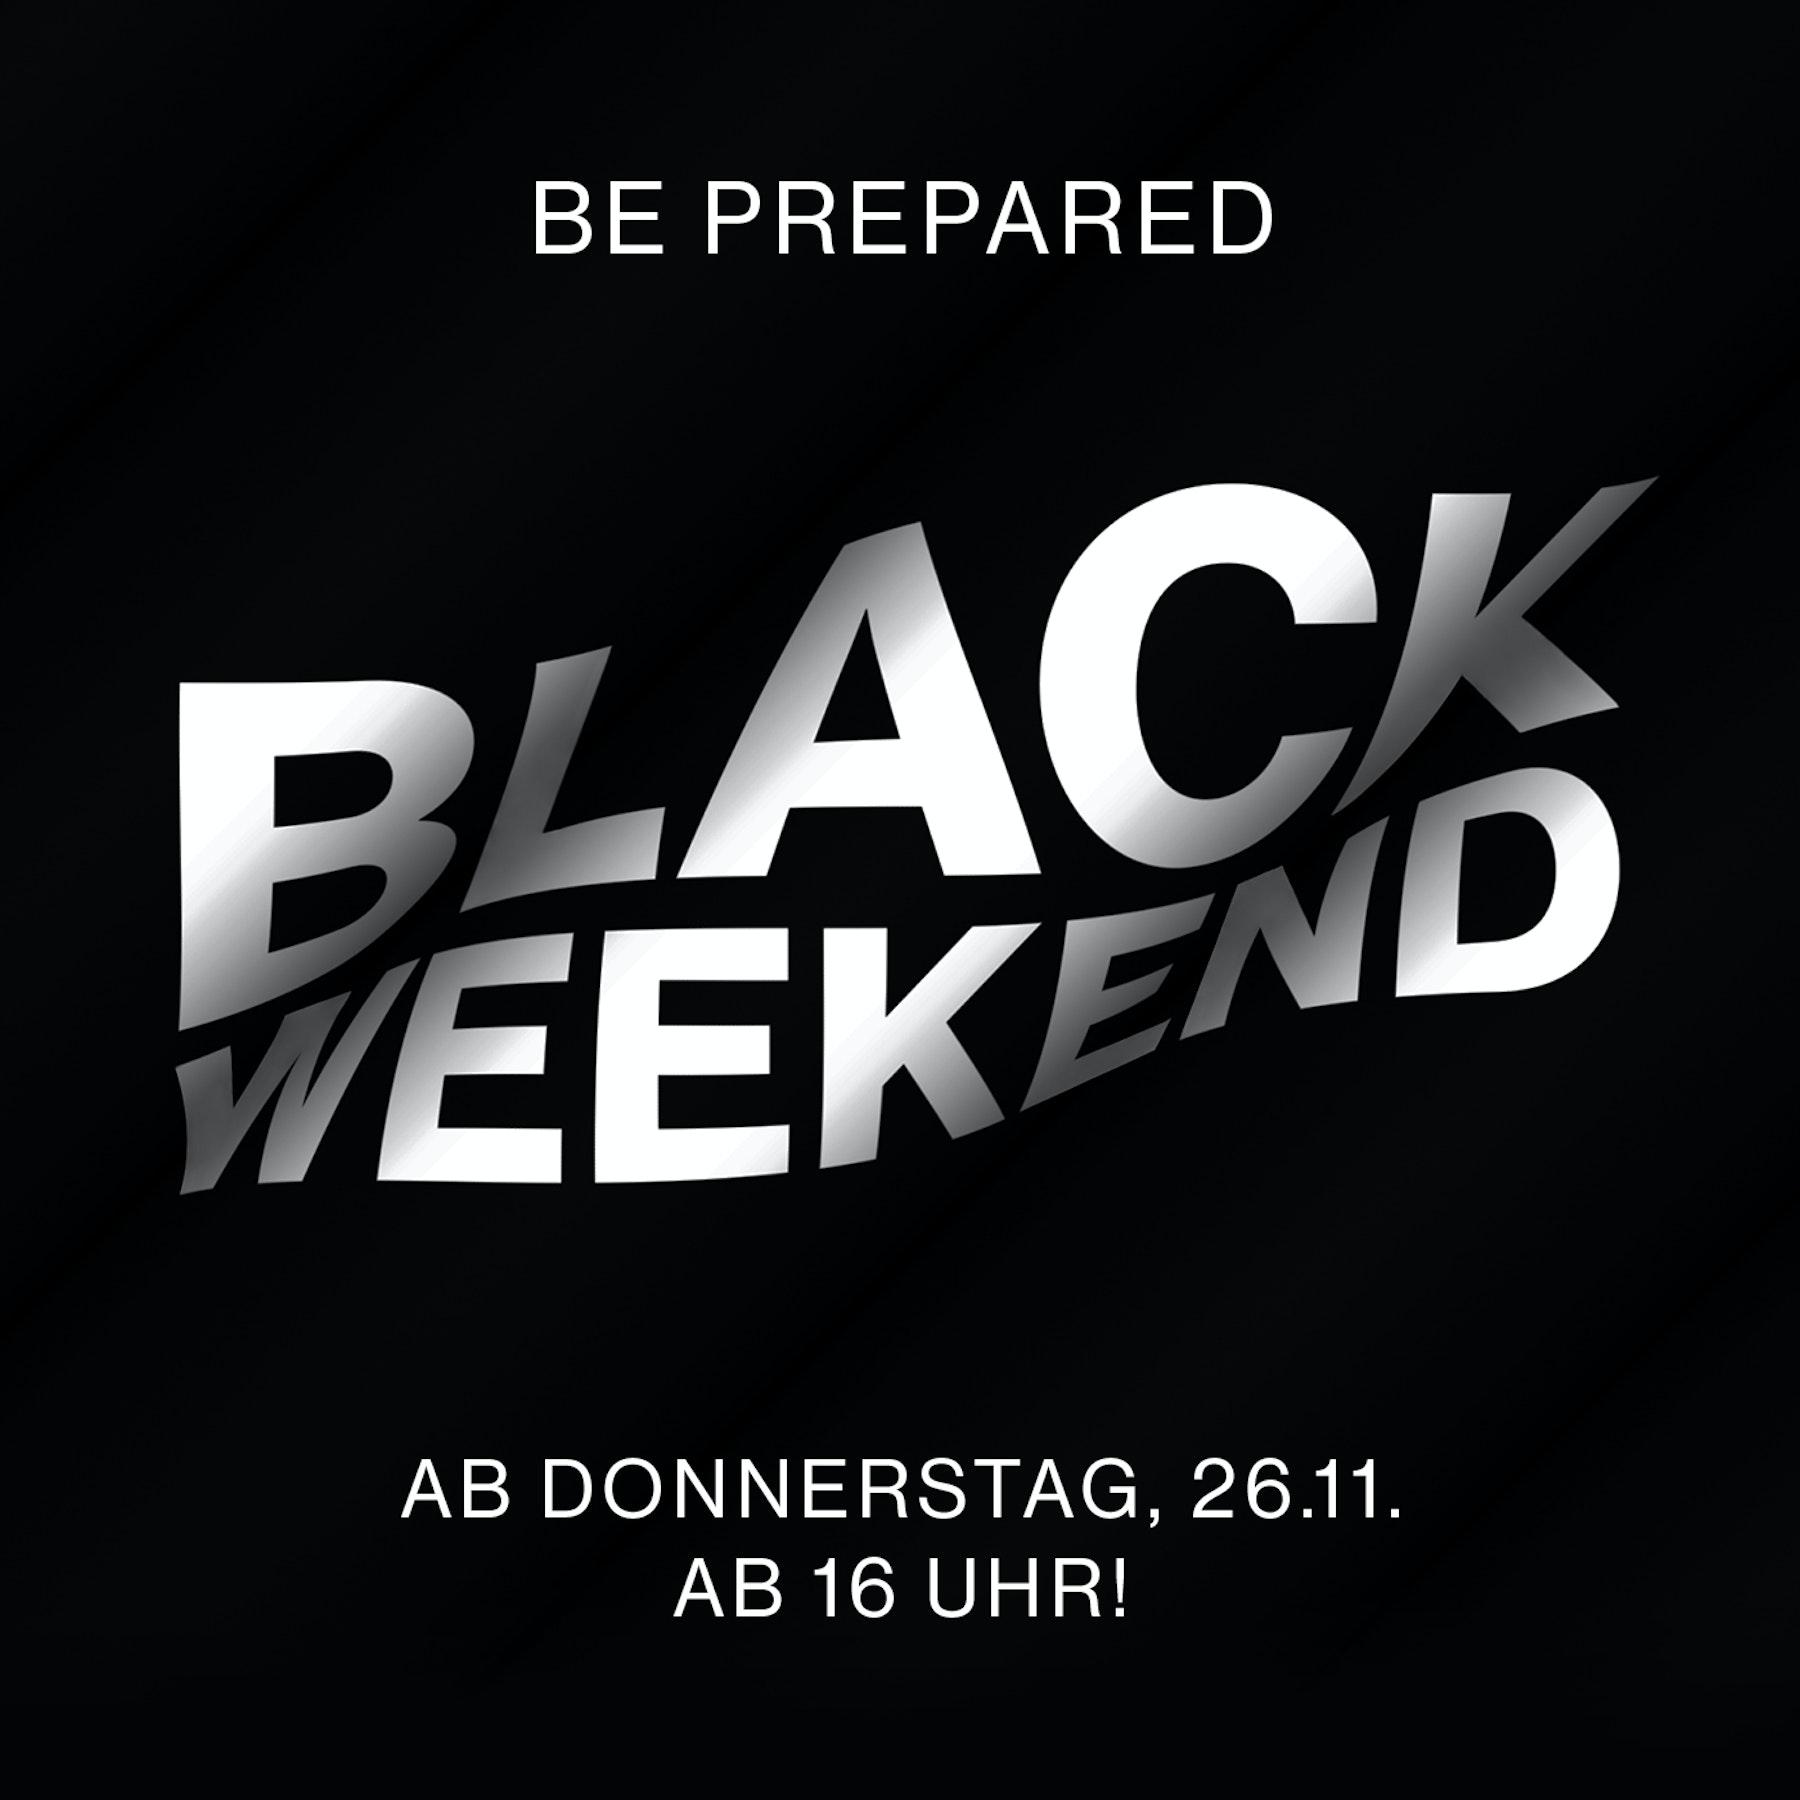 Be prepaired Black Weekend | Seidensticker